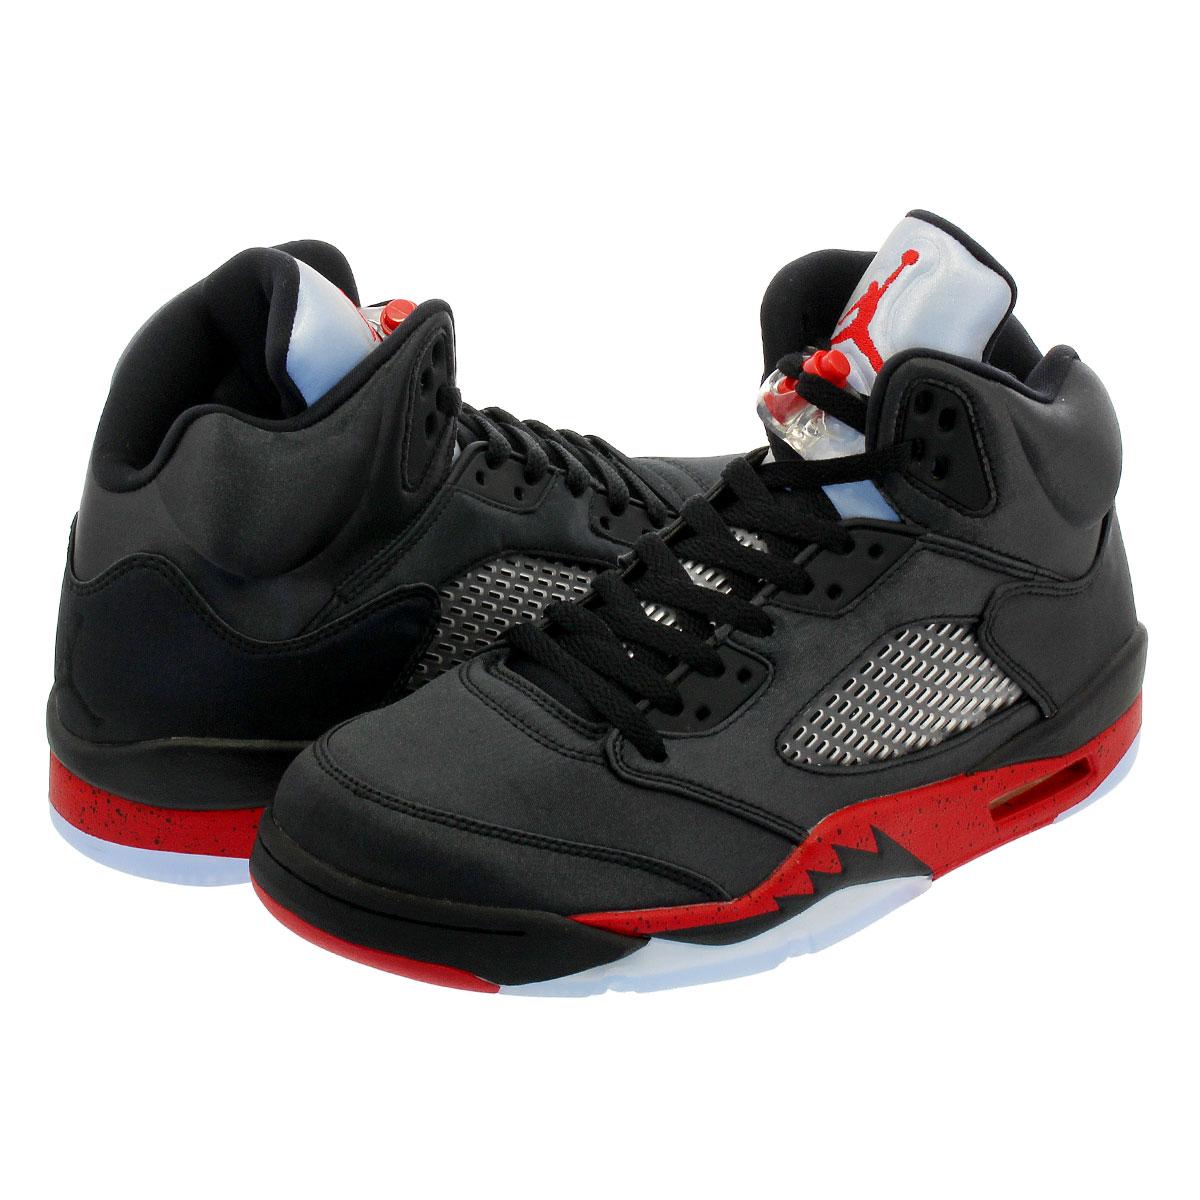 5fe528bb4a3d12 NIKE AIR JORDAN 5 RETRO Nike Air Jordan 5 nostalgic SATIN BLACK UNIVERSITY  RED 136